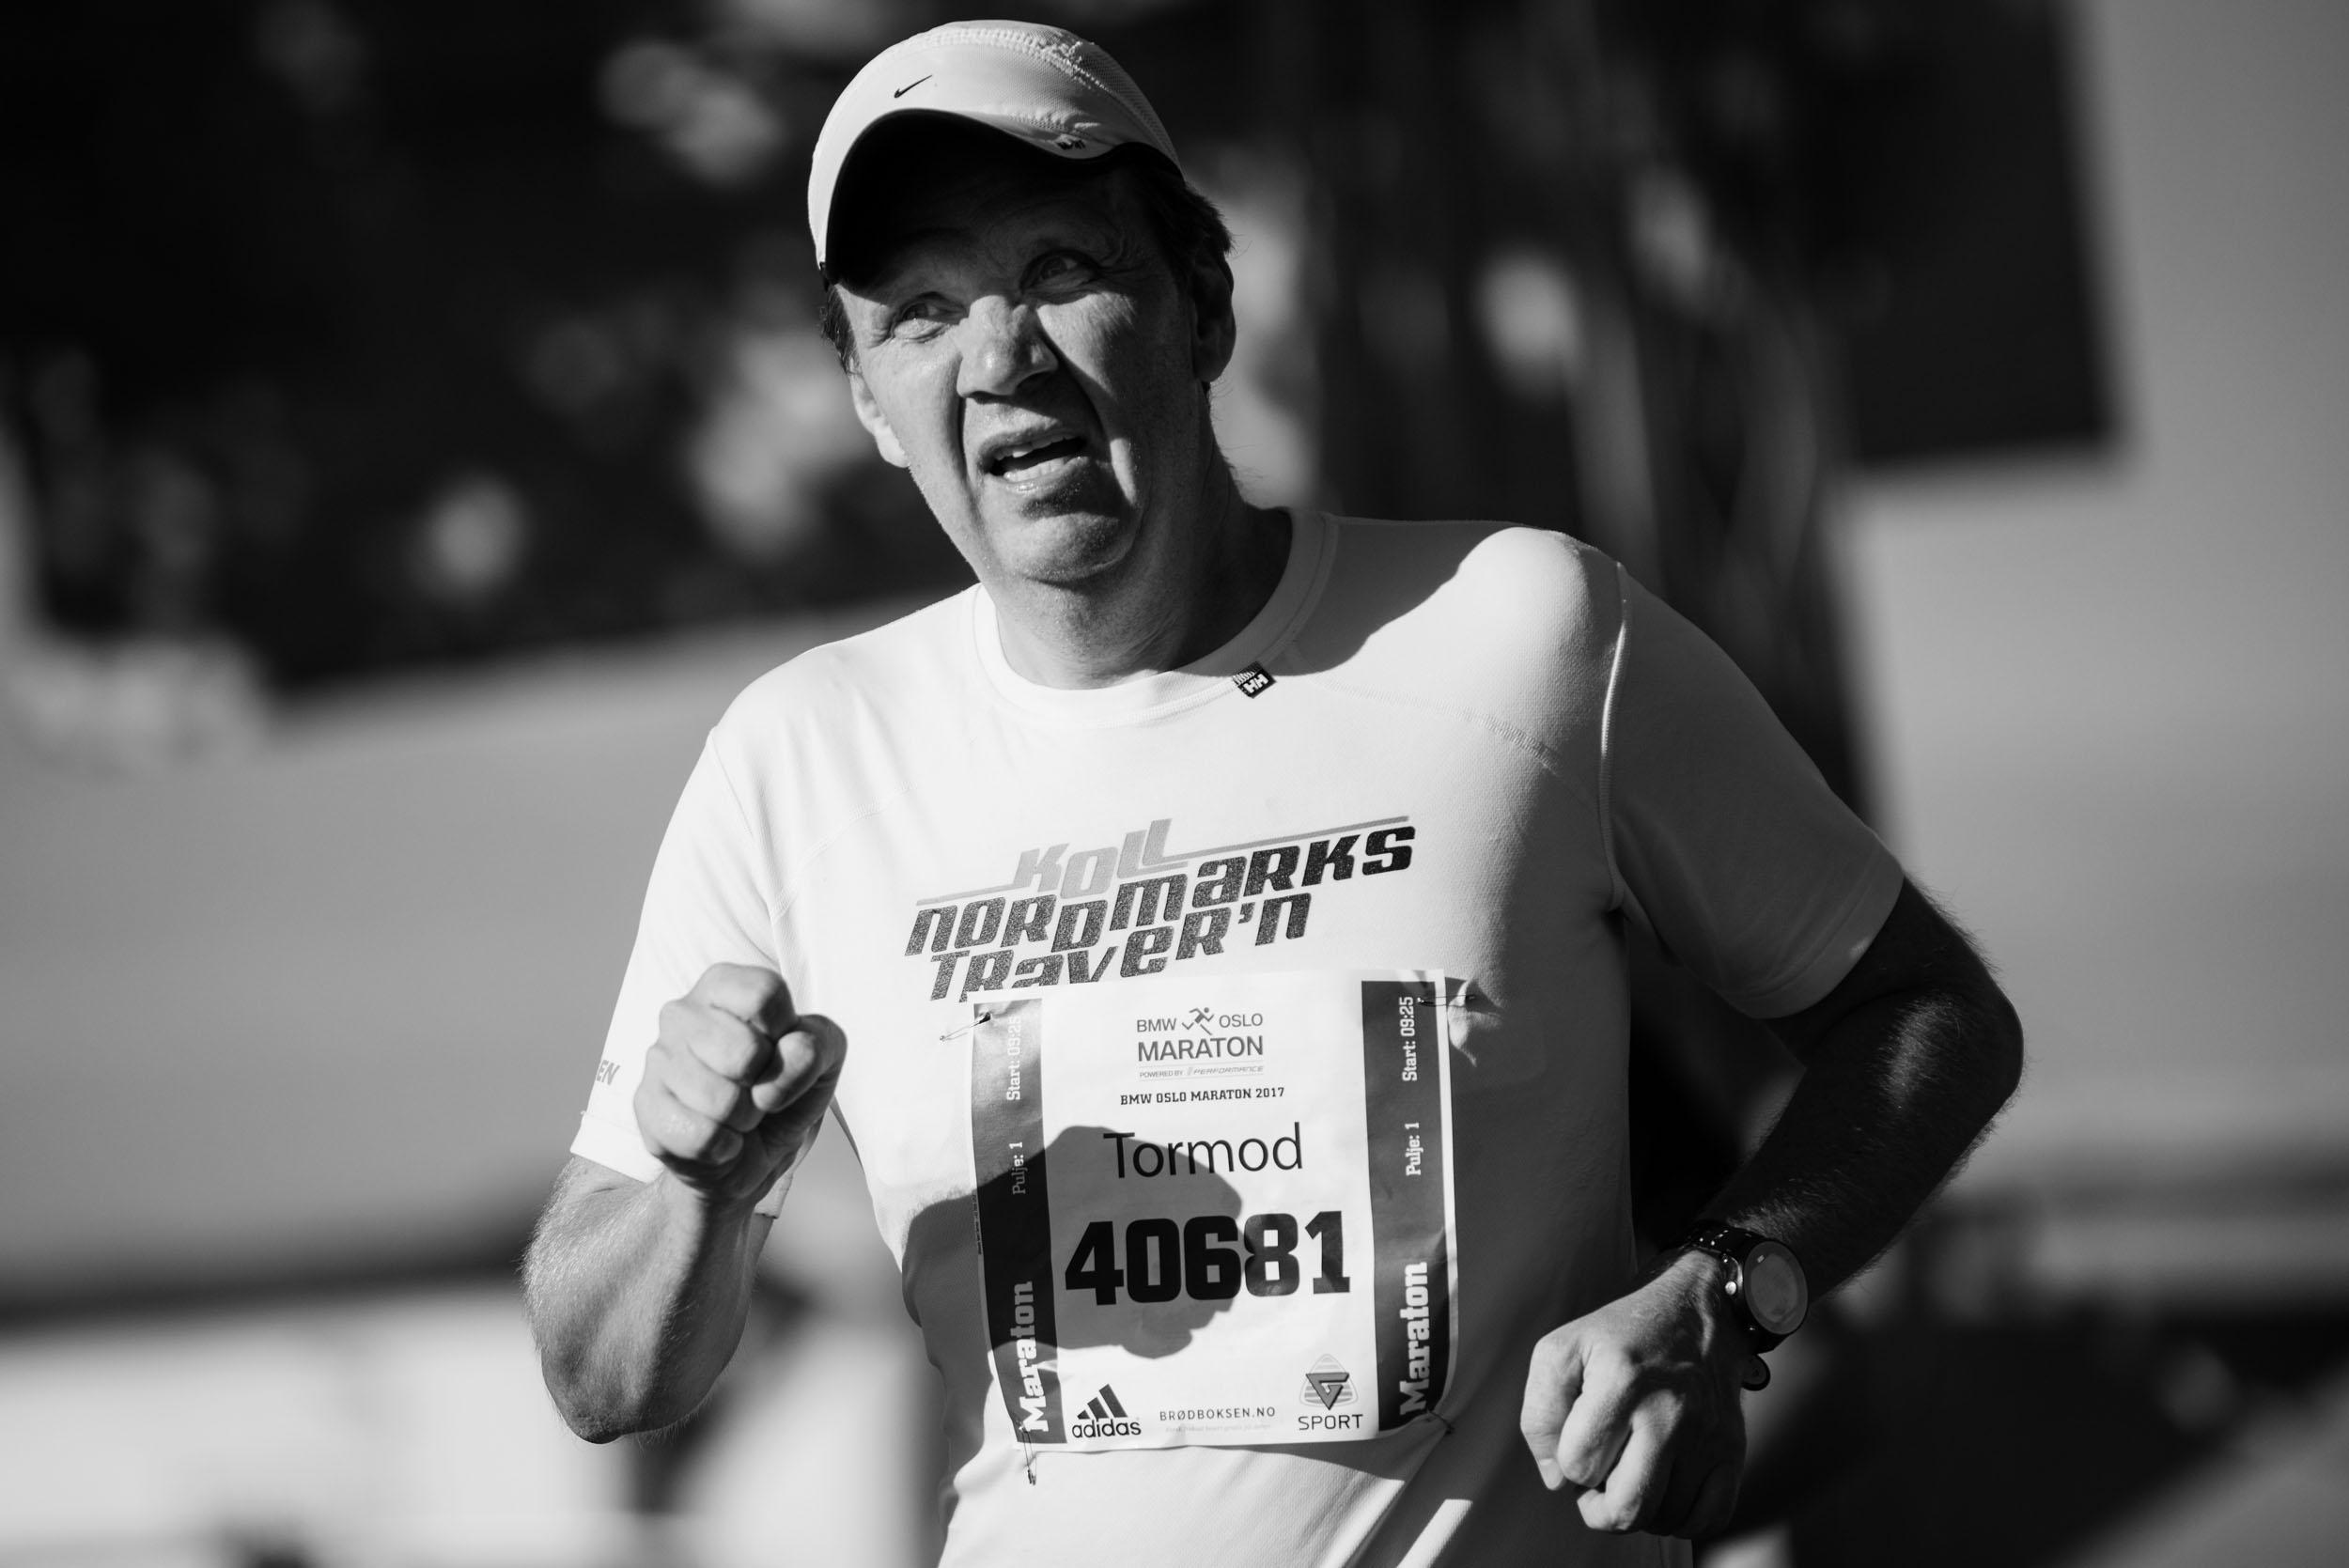 maraton03.jpg